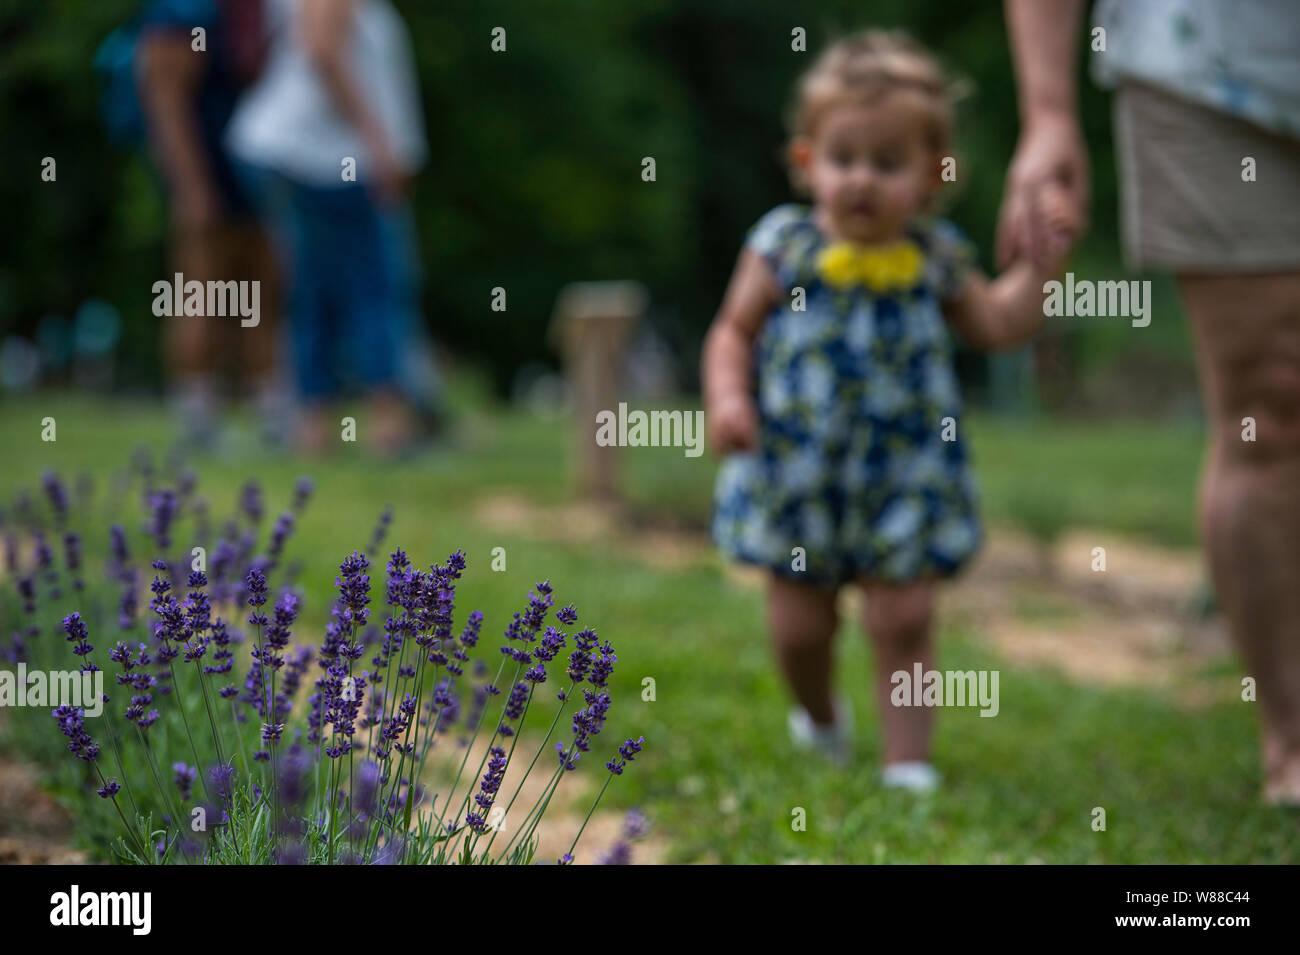 The Landscape Stock Photos & The Landscape Stock Images